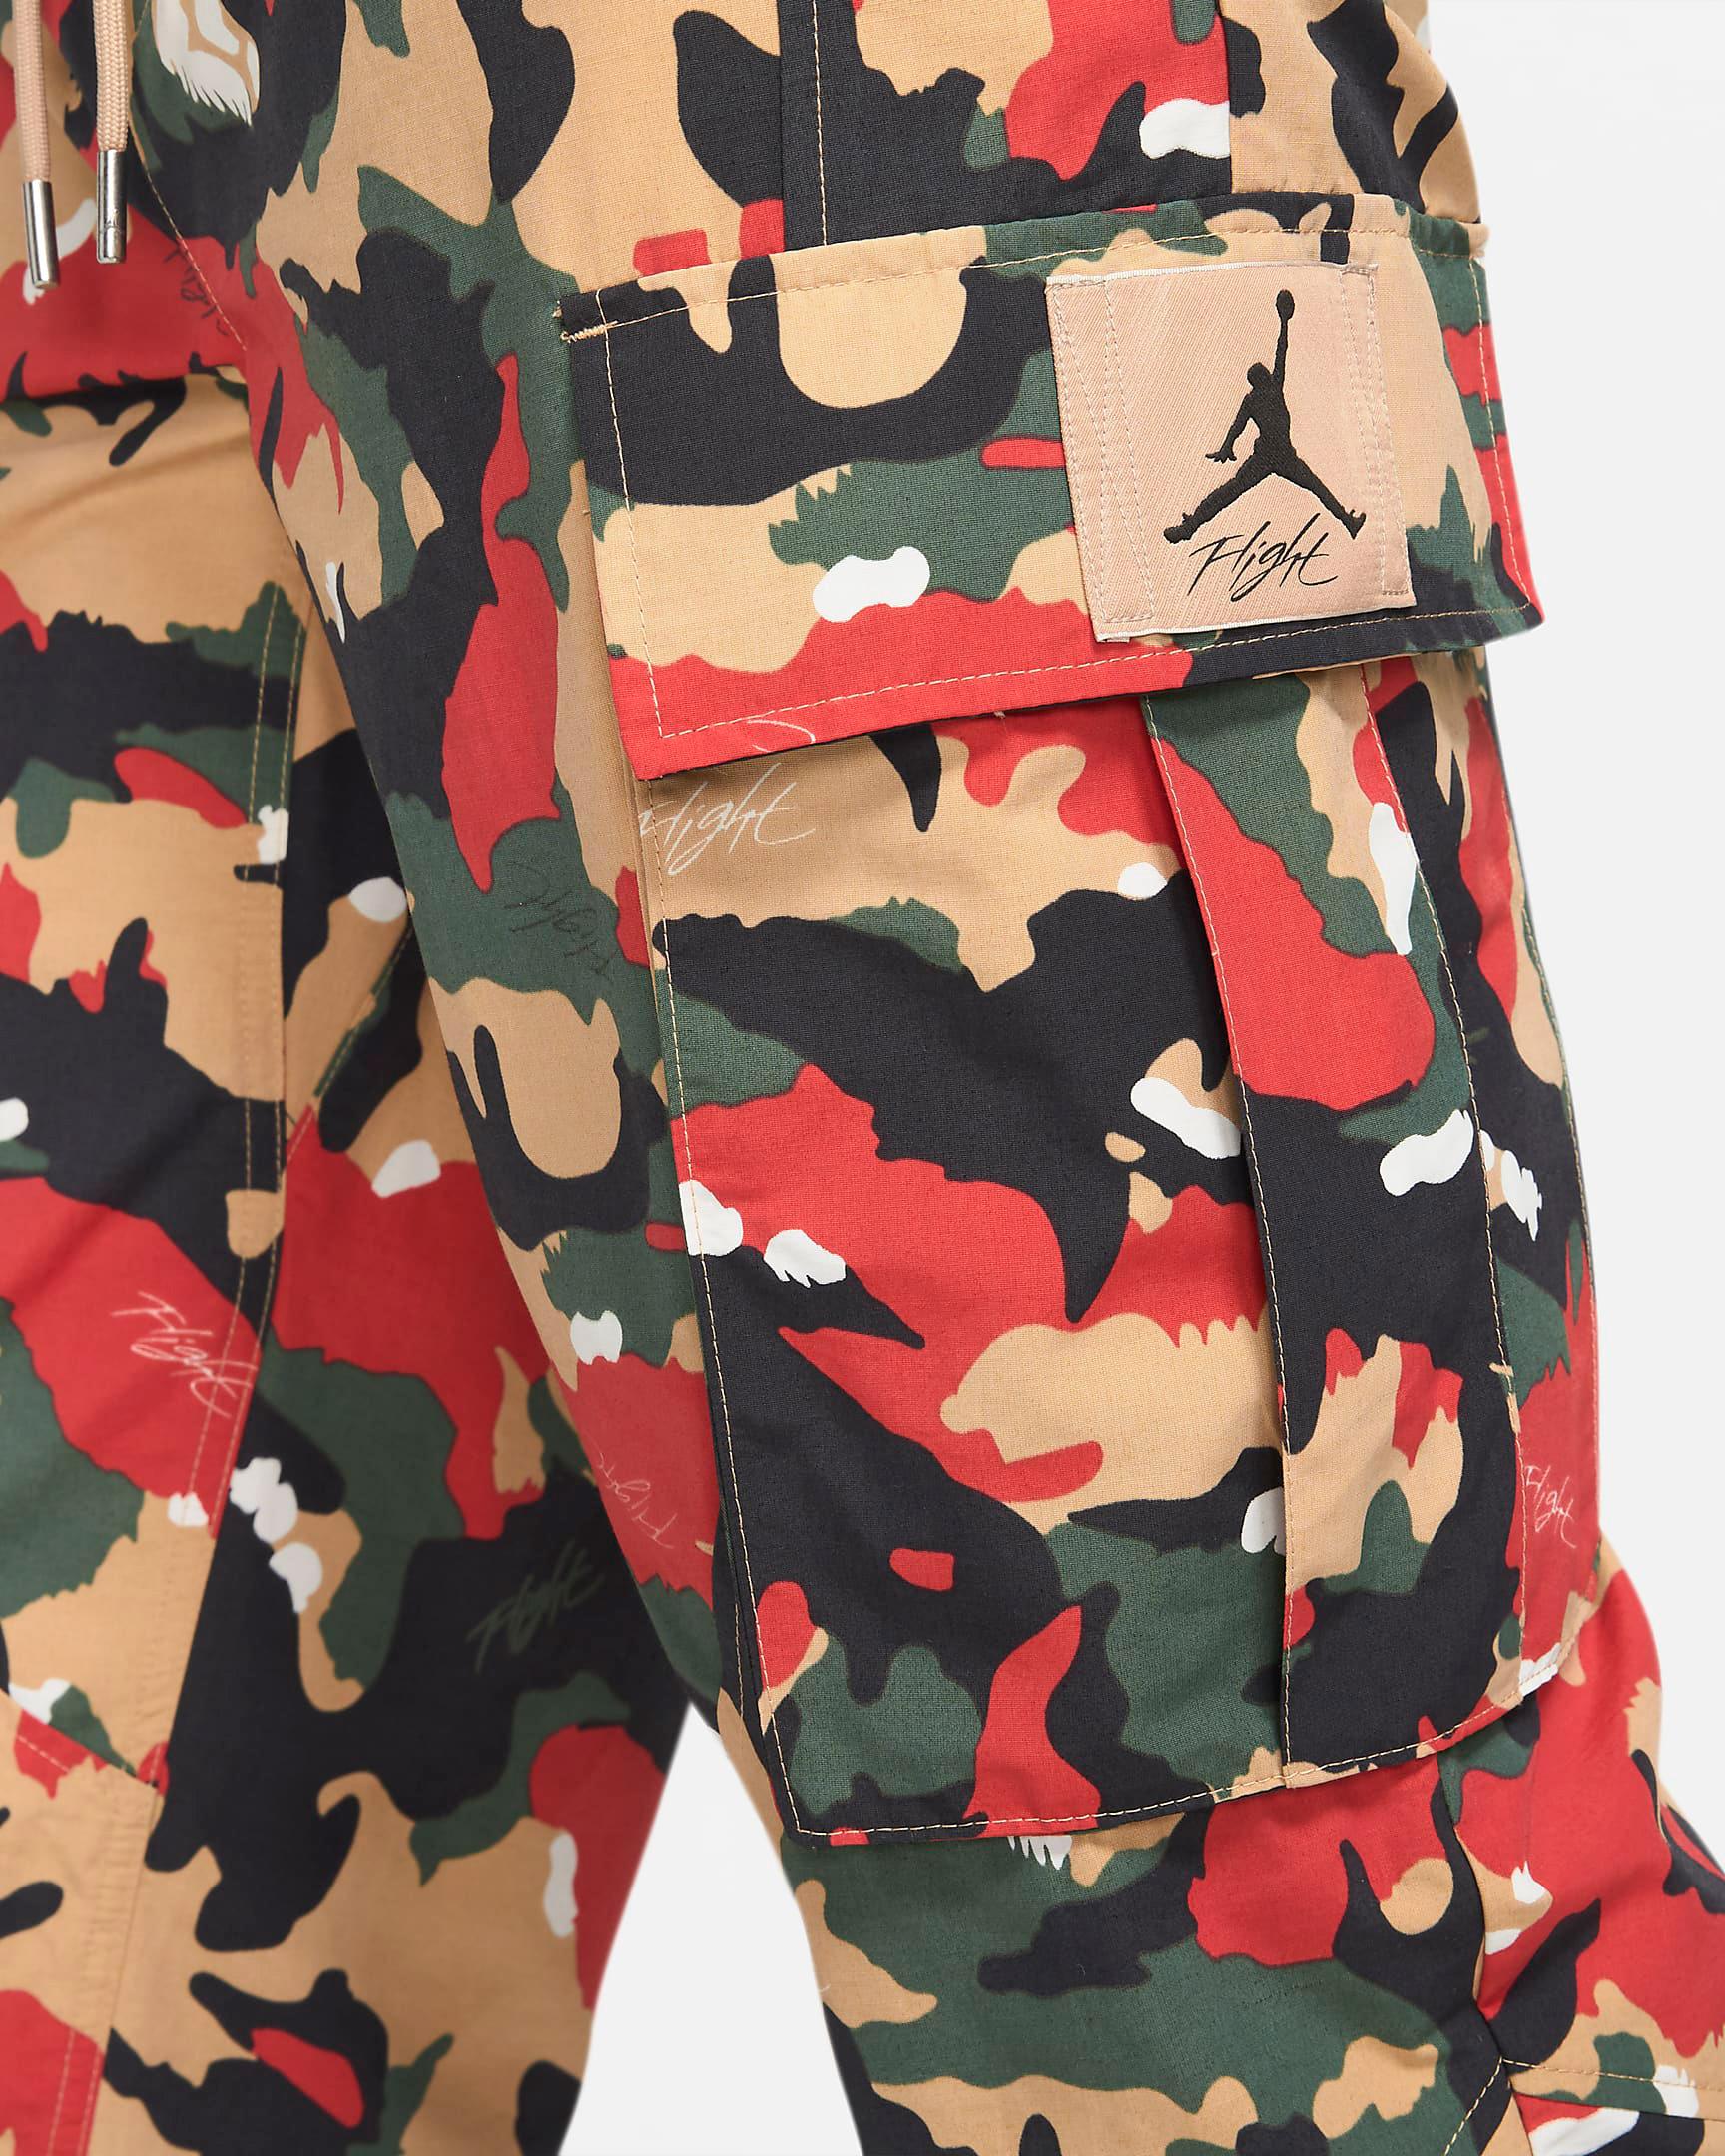 jordan-flight-heritage-cargo-pants-hemp-tan-red-green-4